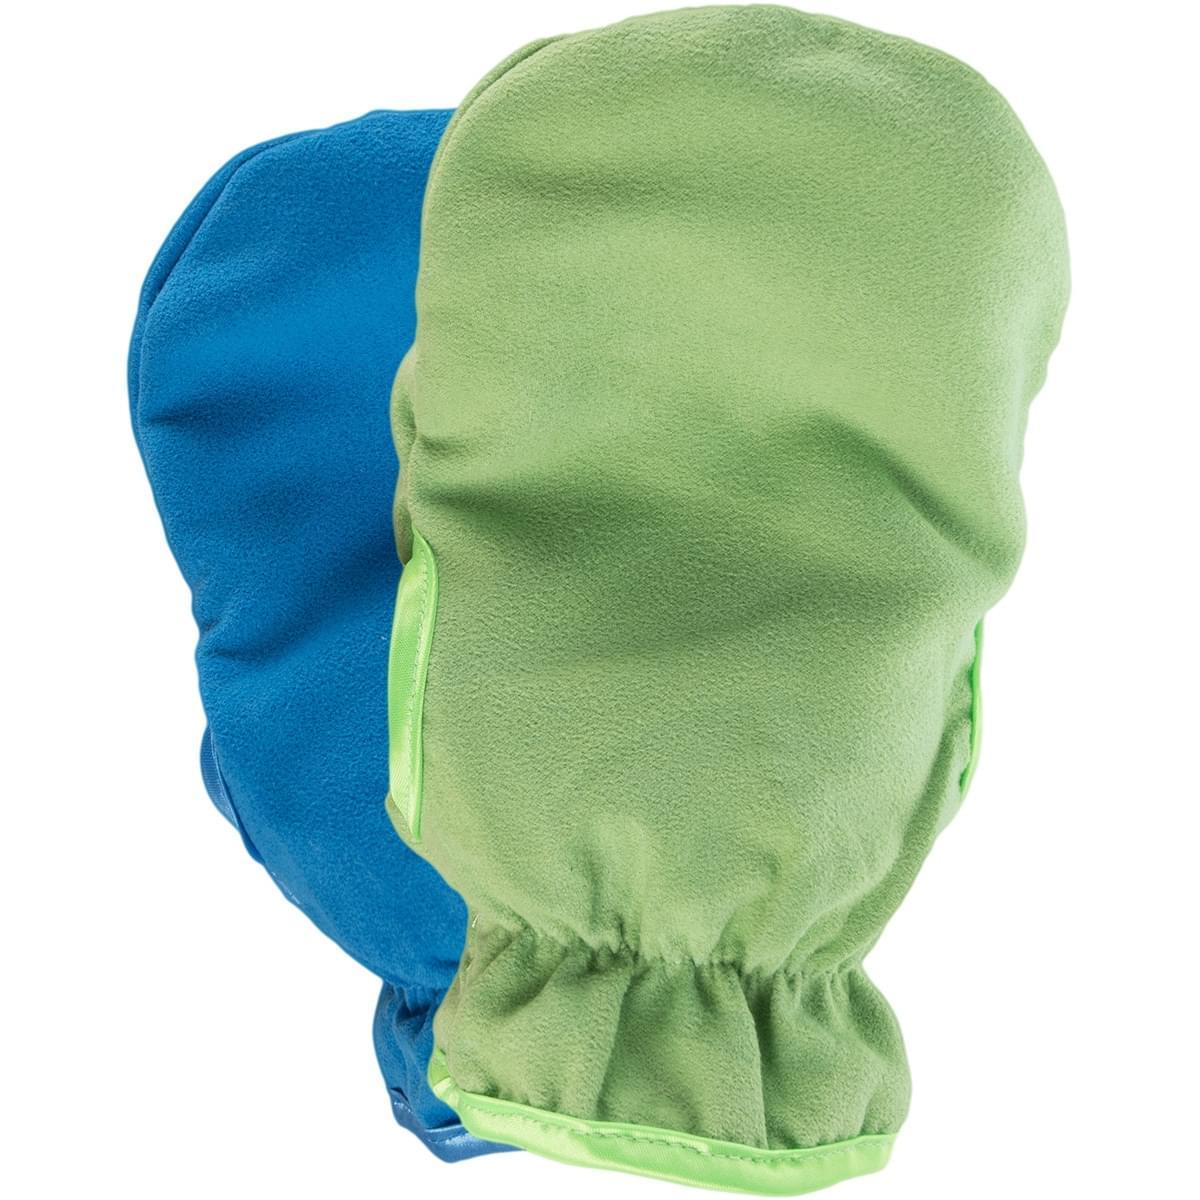 Rubytec Samos Washing Gloves Green & Blue